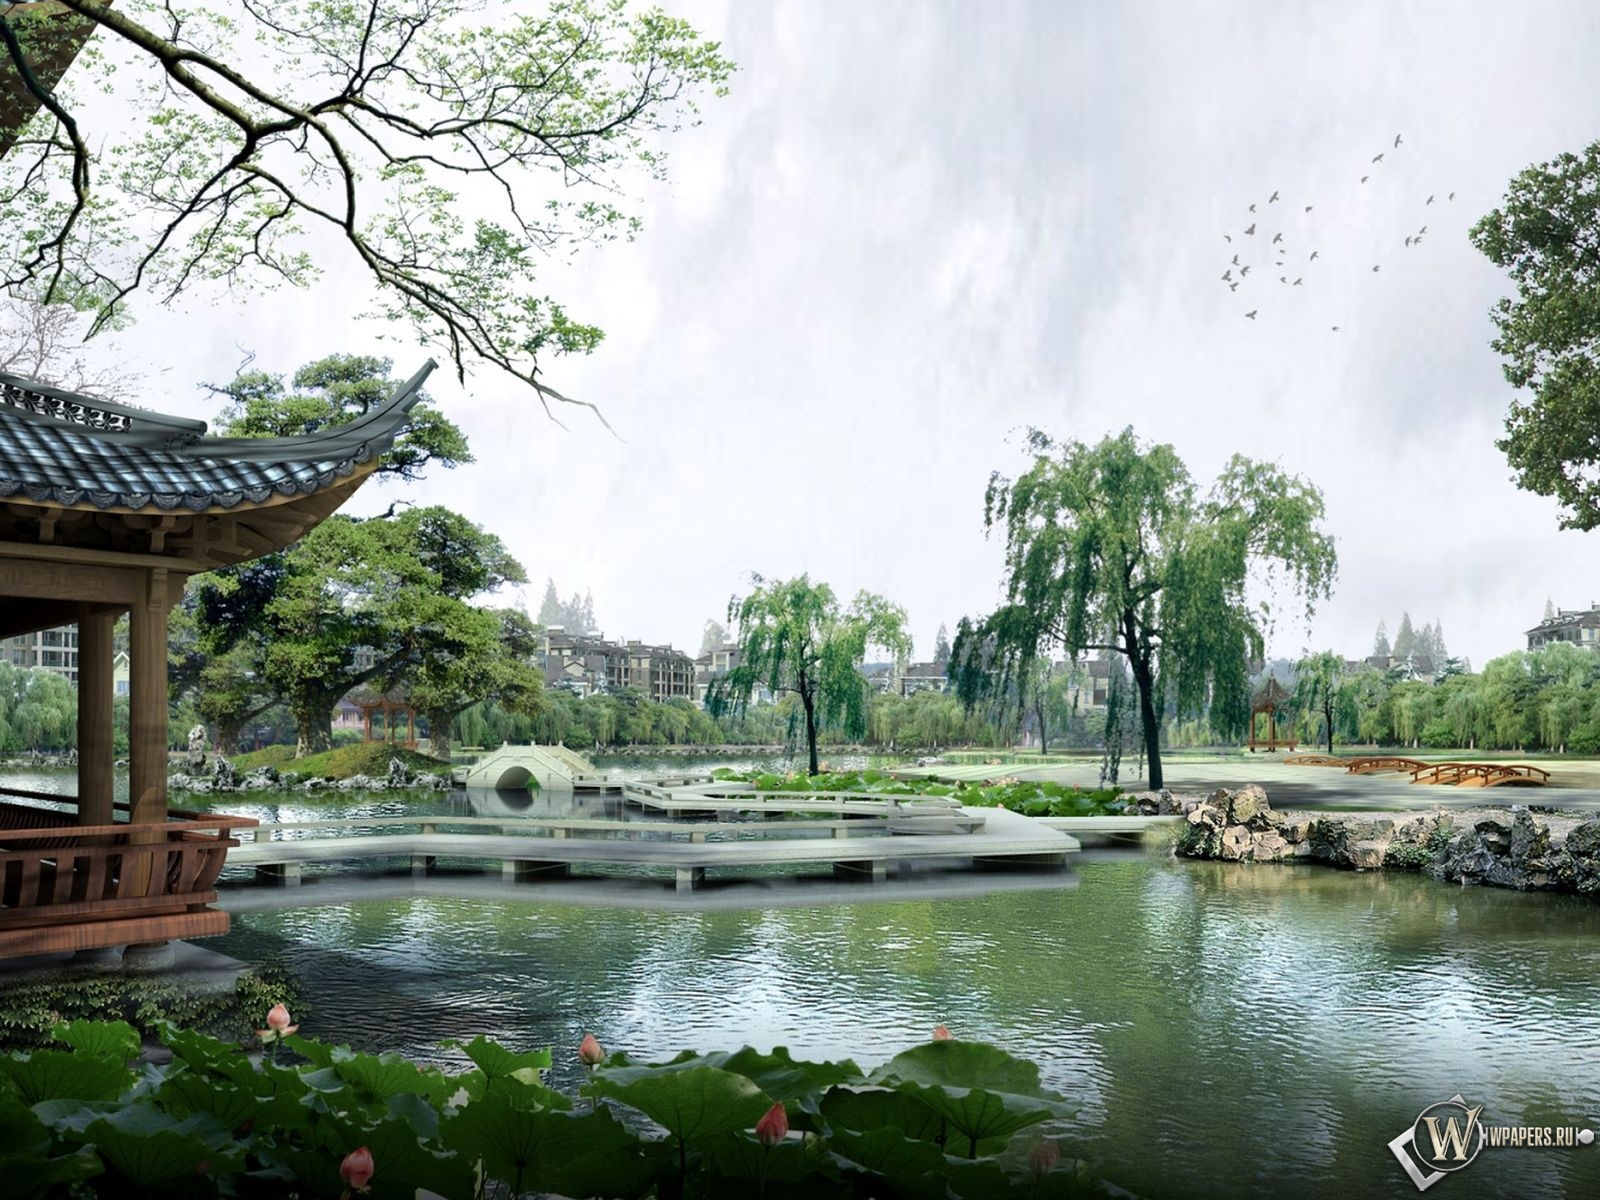 Парк япония ландшафт 1600x1200 картинки